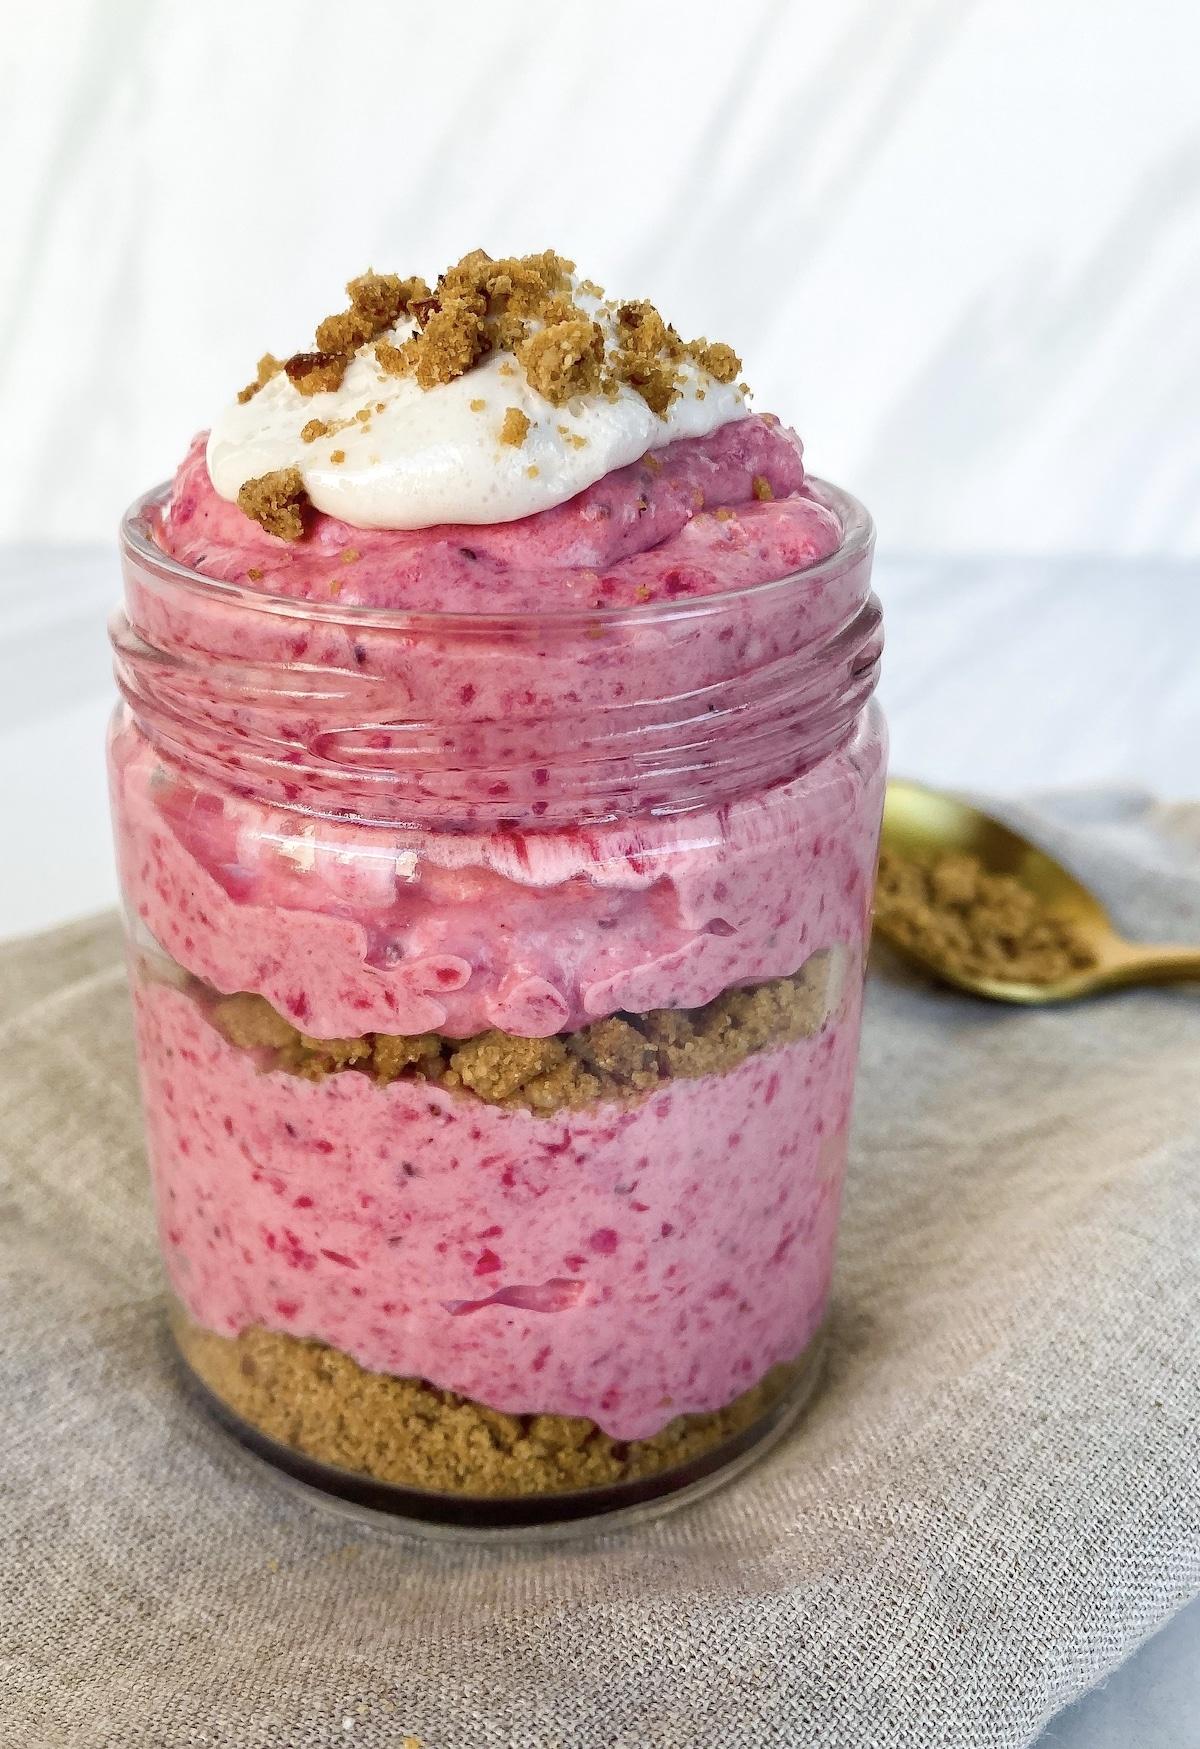 Layered strawberry cheesecake dessert in a glass jar